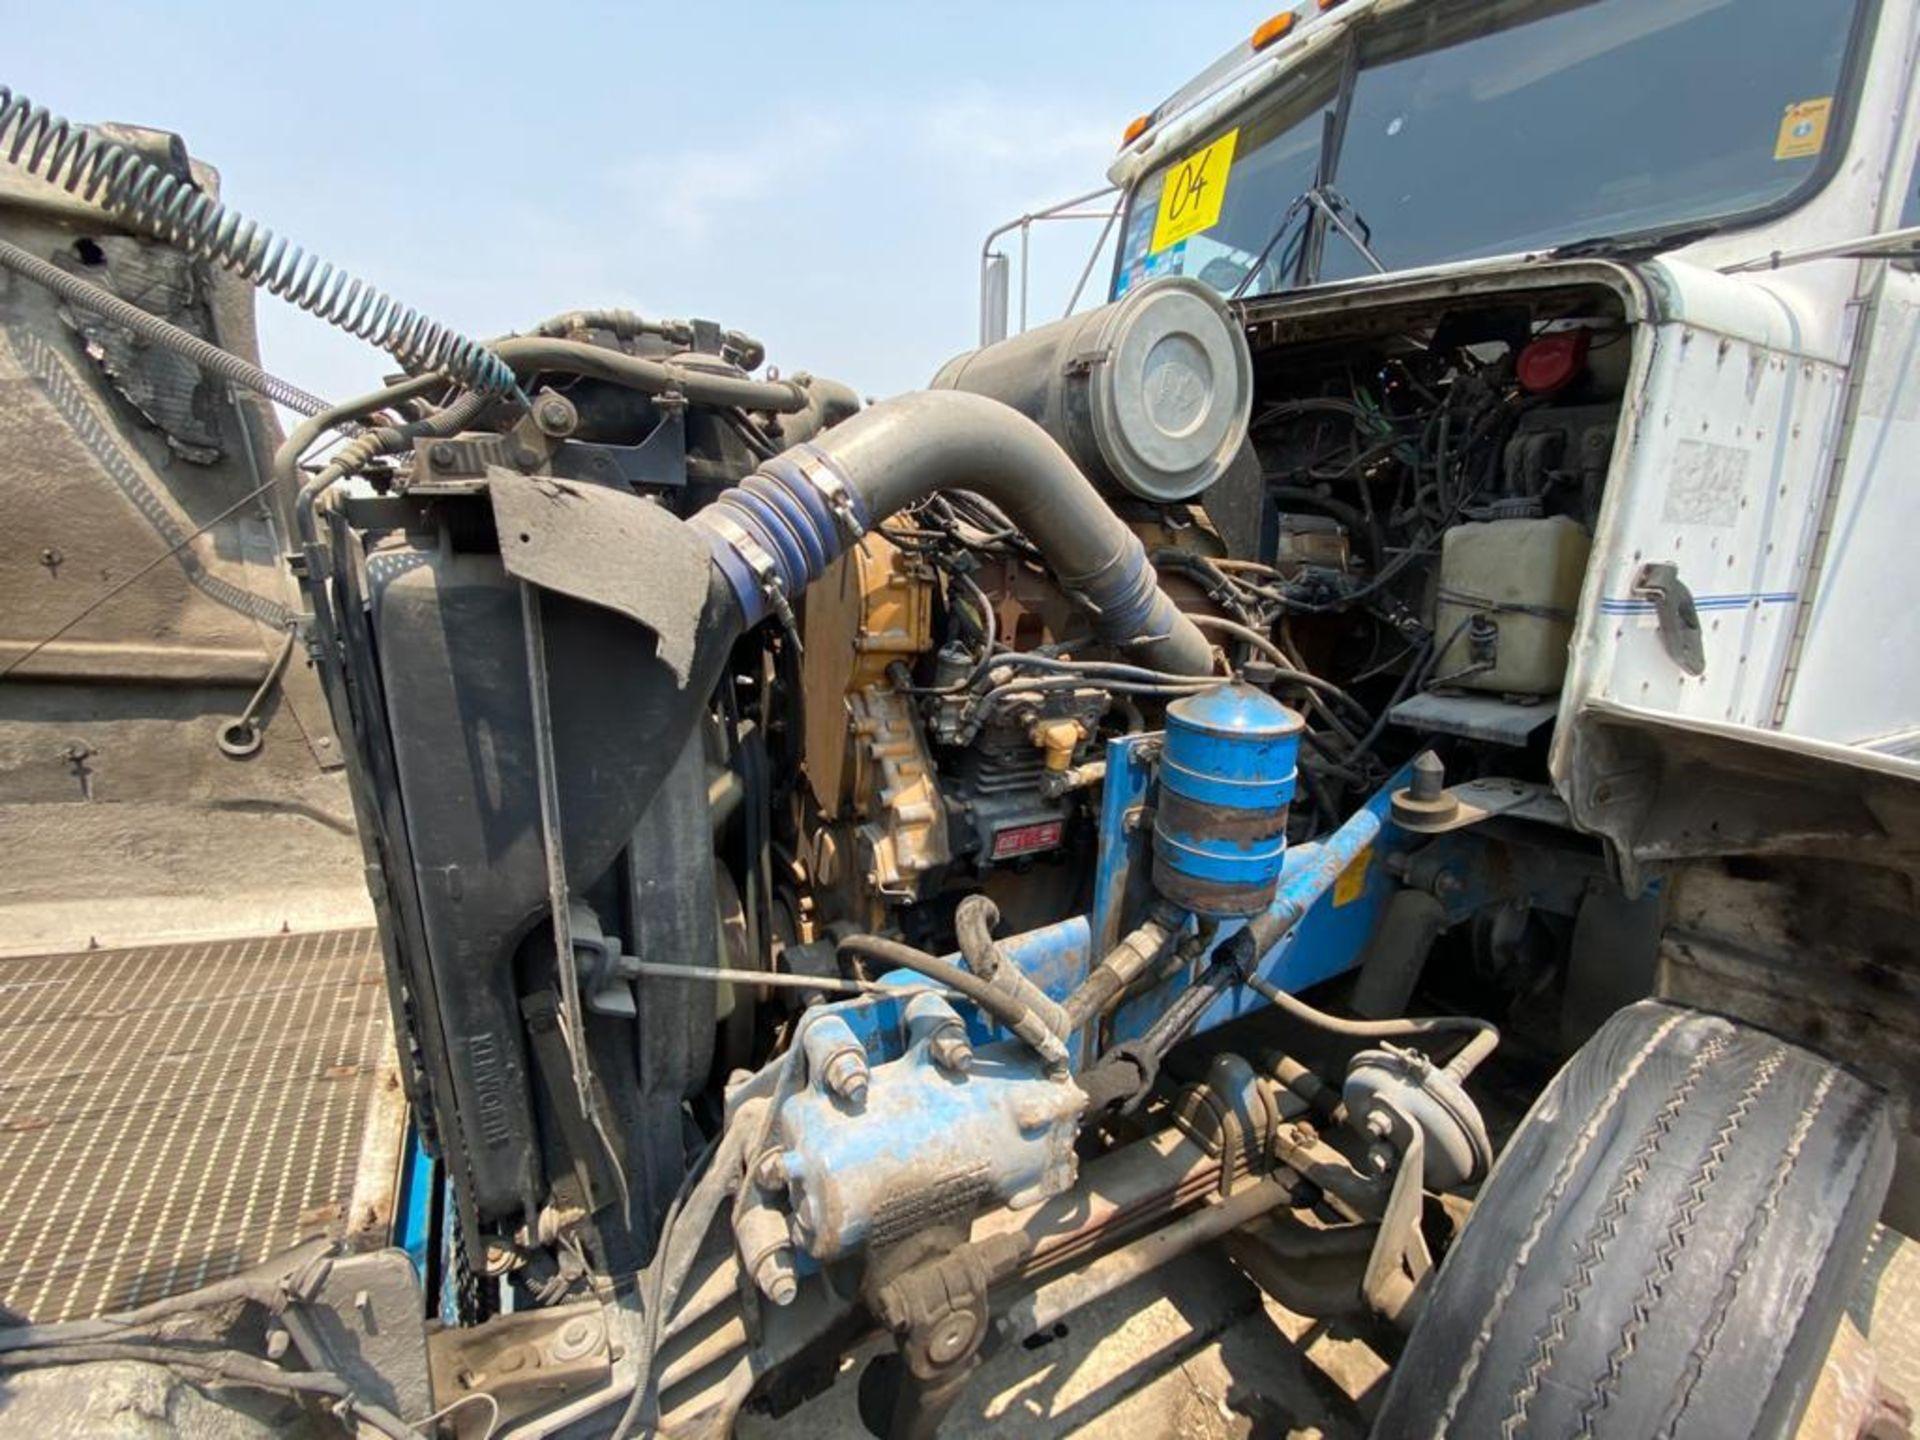 1999 Kenworth Sleeper truck tractor, standard transmission of 18 speeds - Image 51 of 70